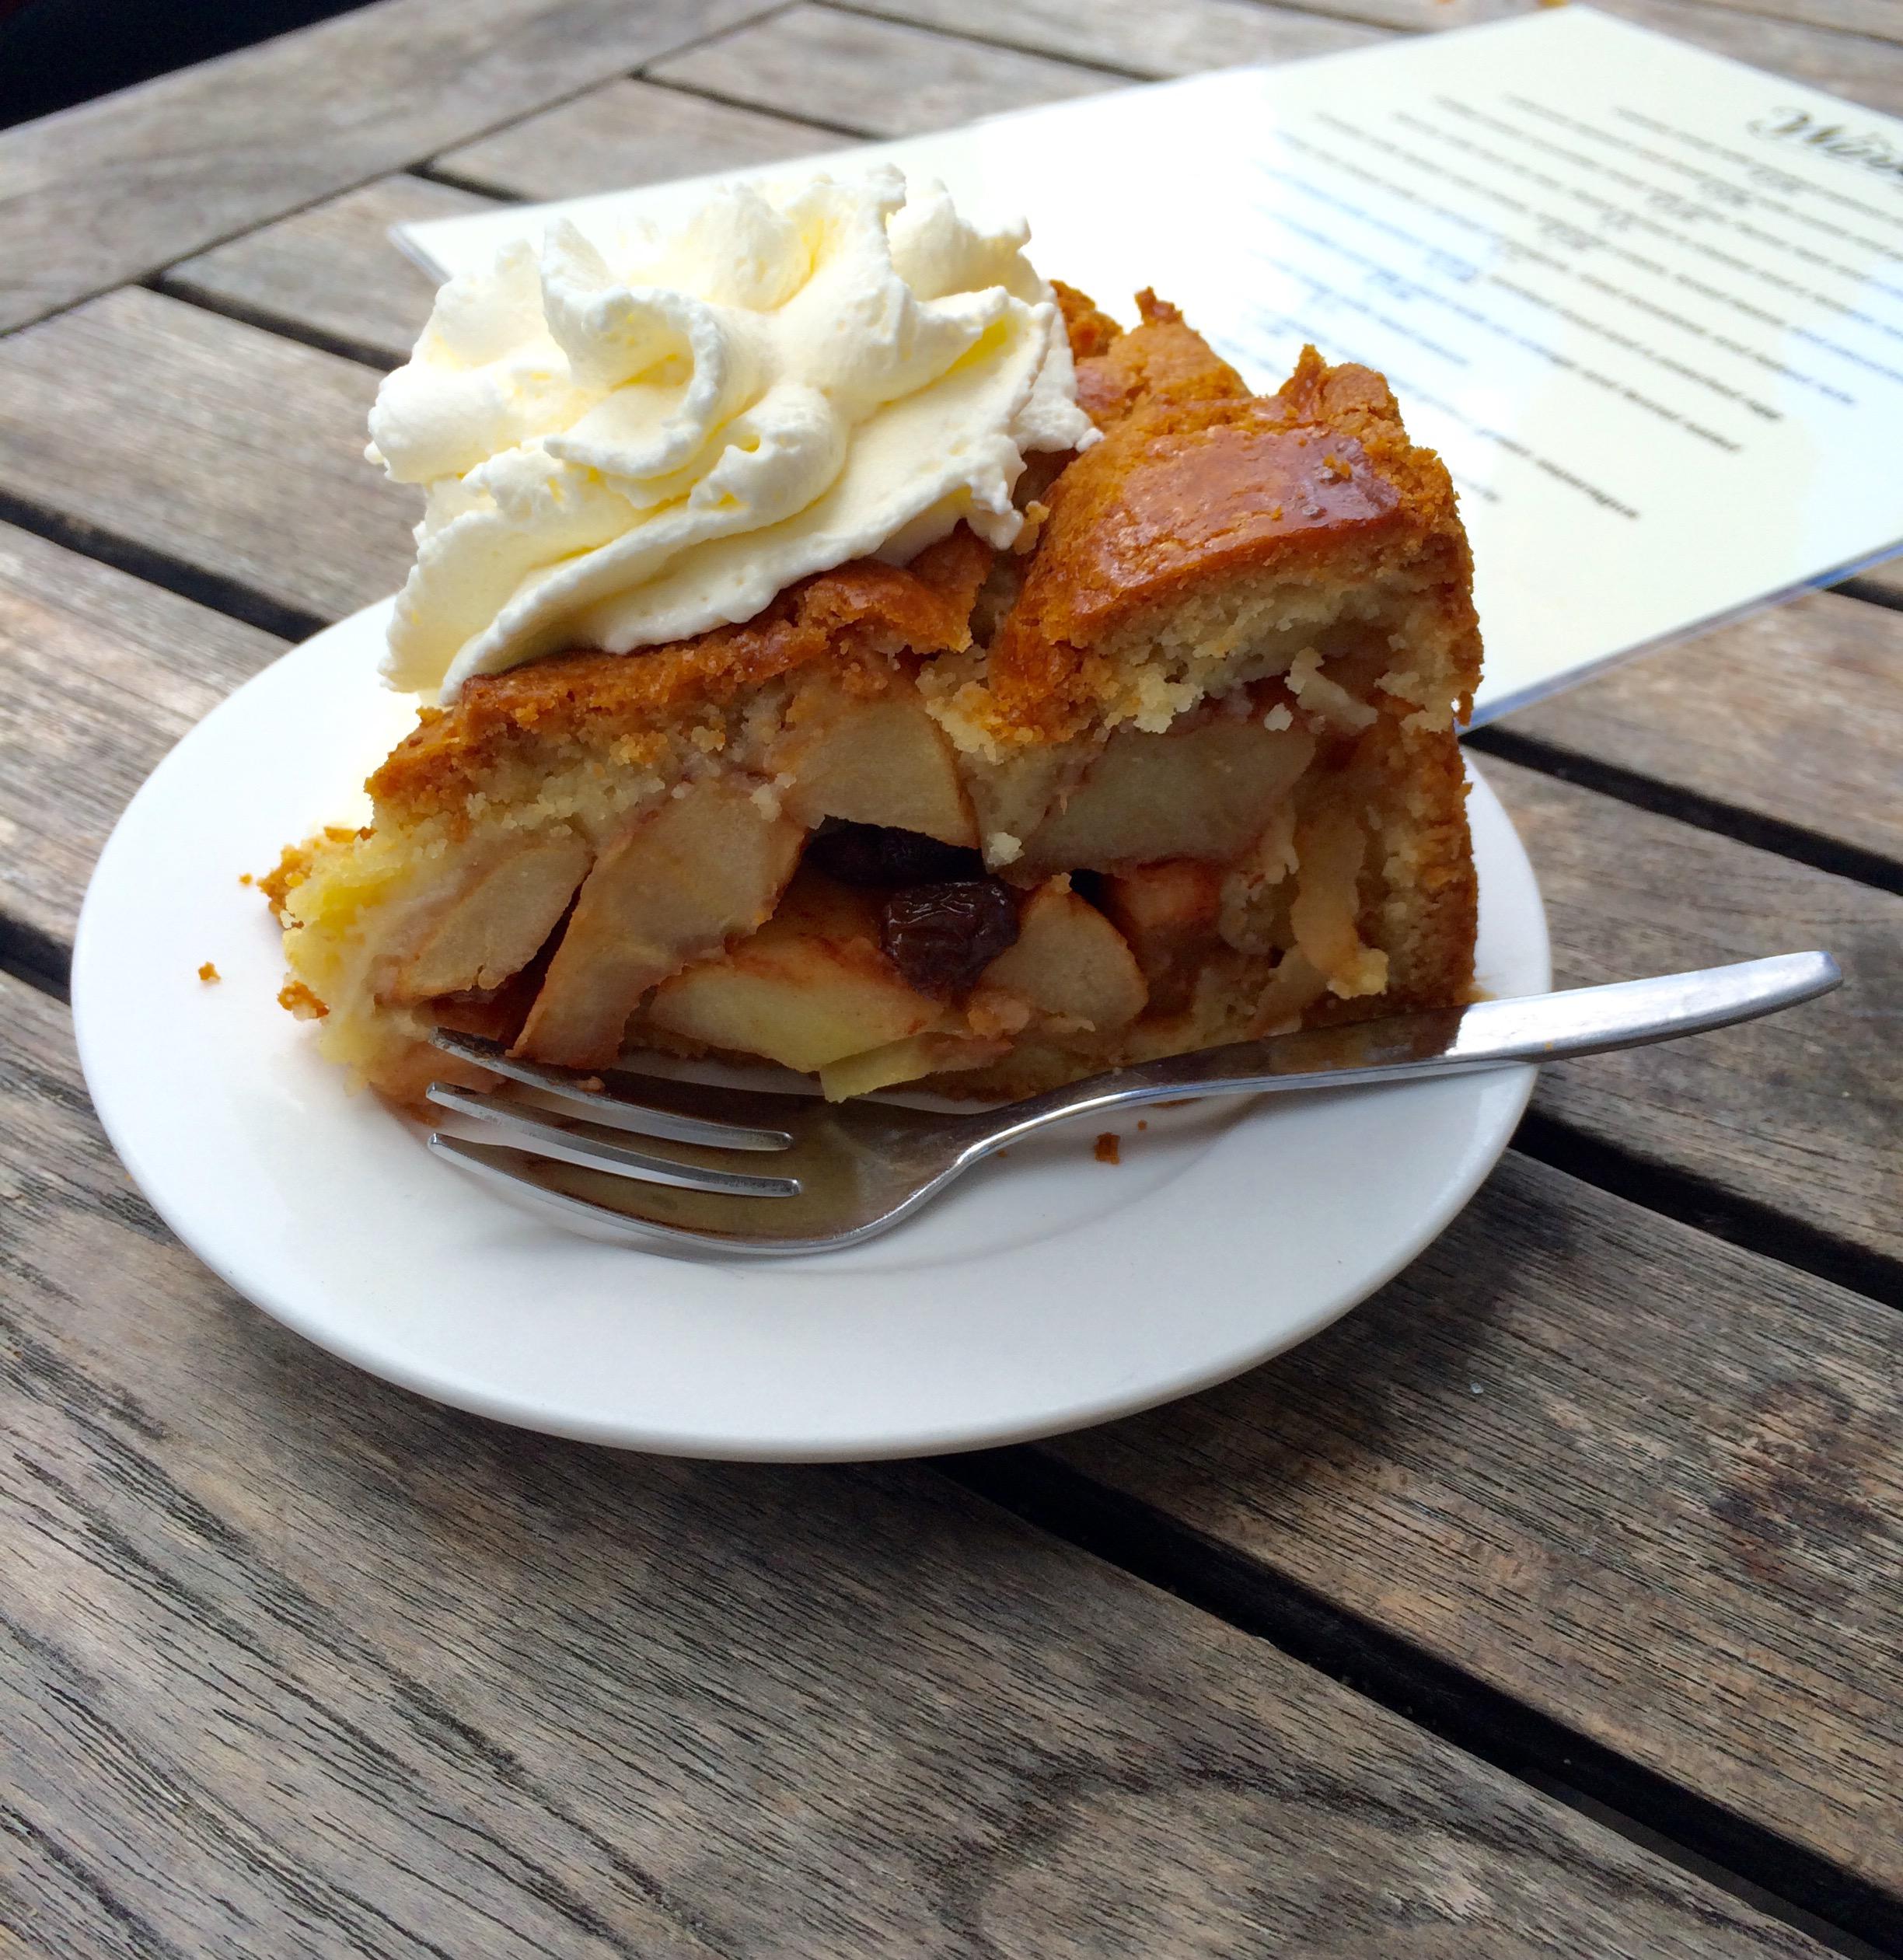 Apple Tart at Winkel Cafe